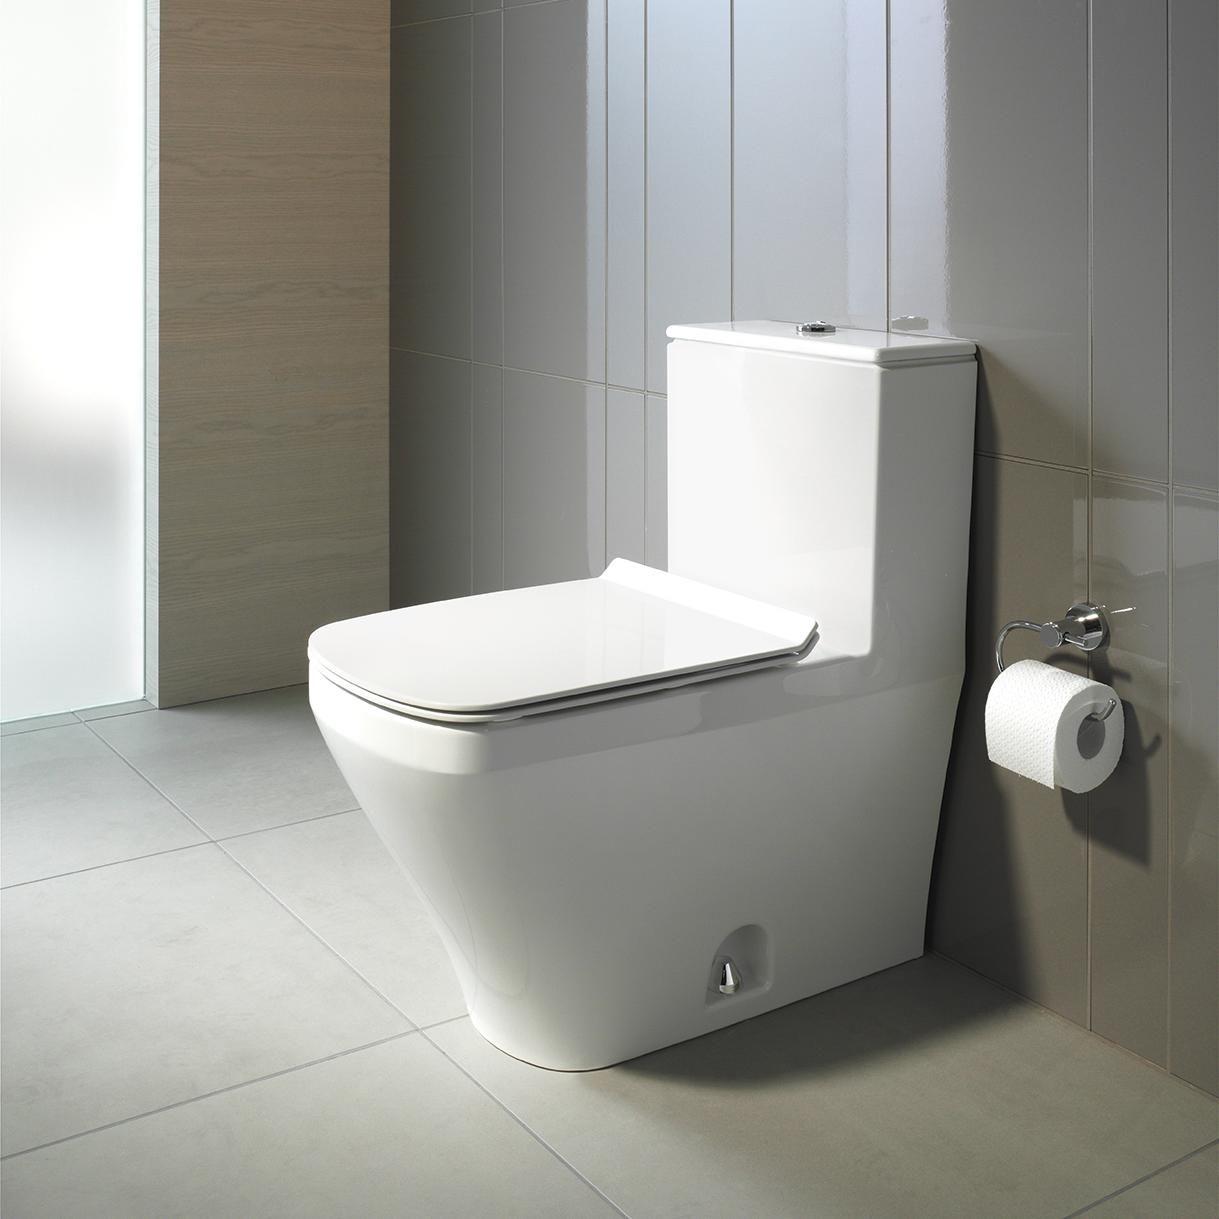 Durastyle One Piece Toilet Modern Toilet One Piece Toilets Modern Bathroom